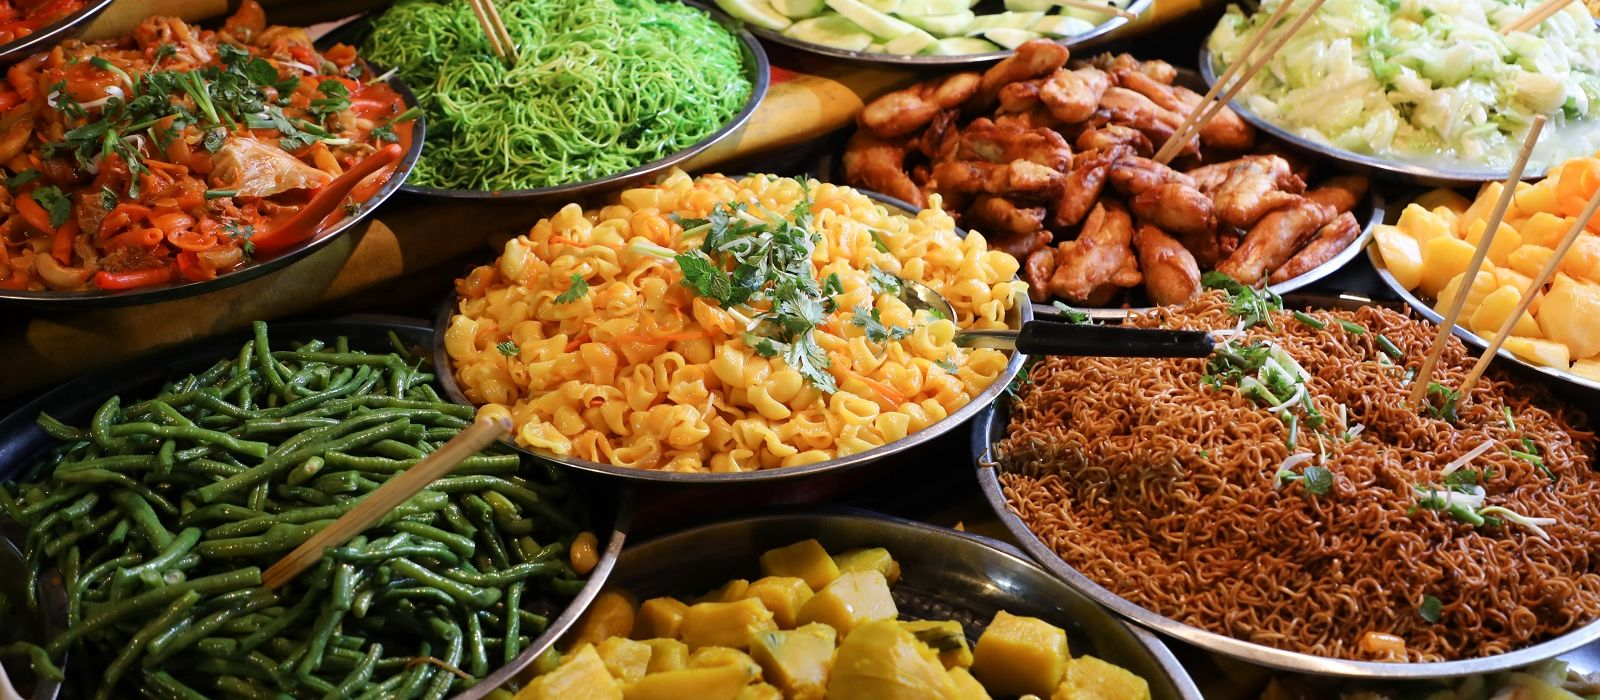 Laos_ traditional street food in the market in luang prabang laos Asia Enchanting Travels - Cuisine in Laos